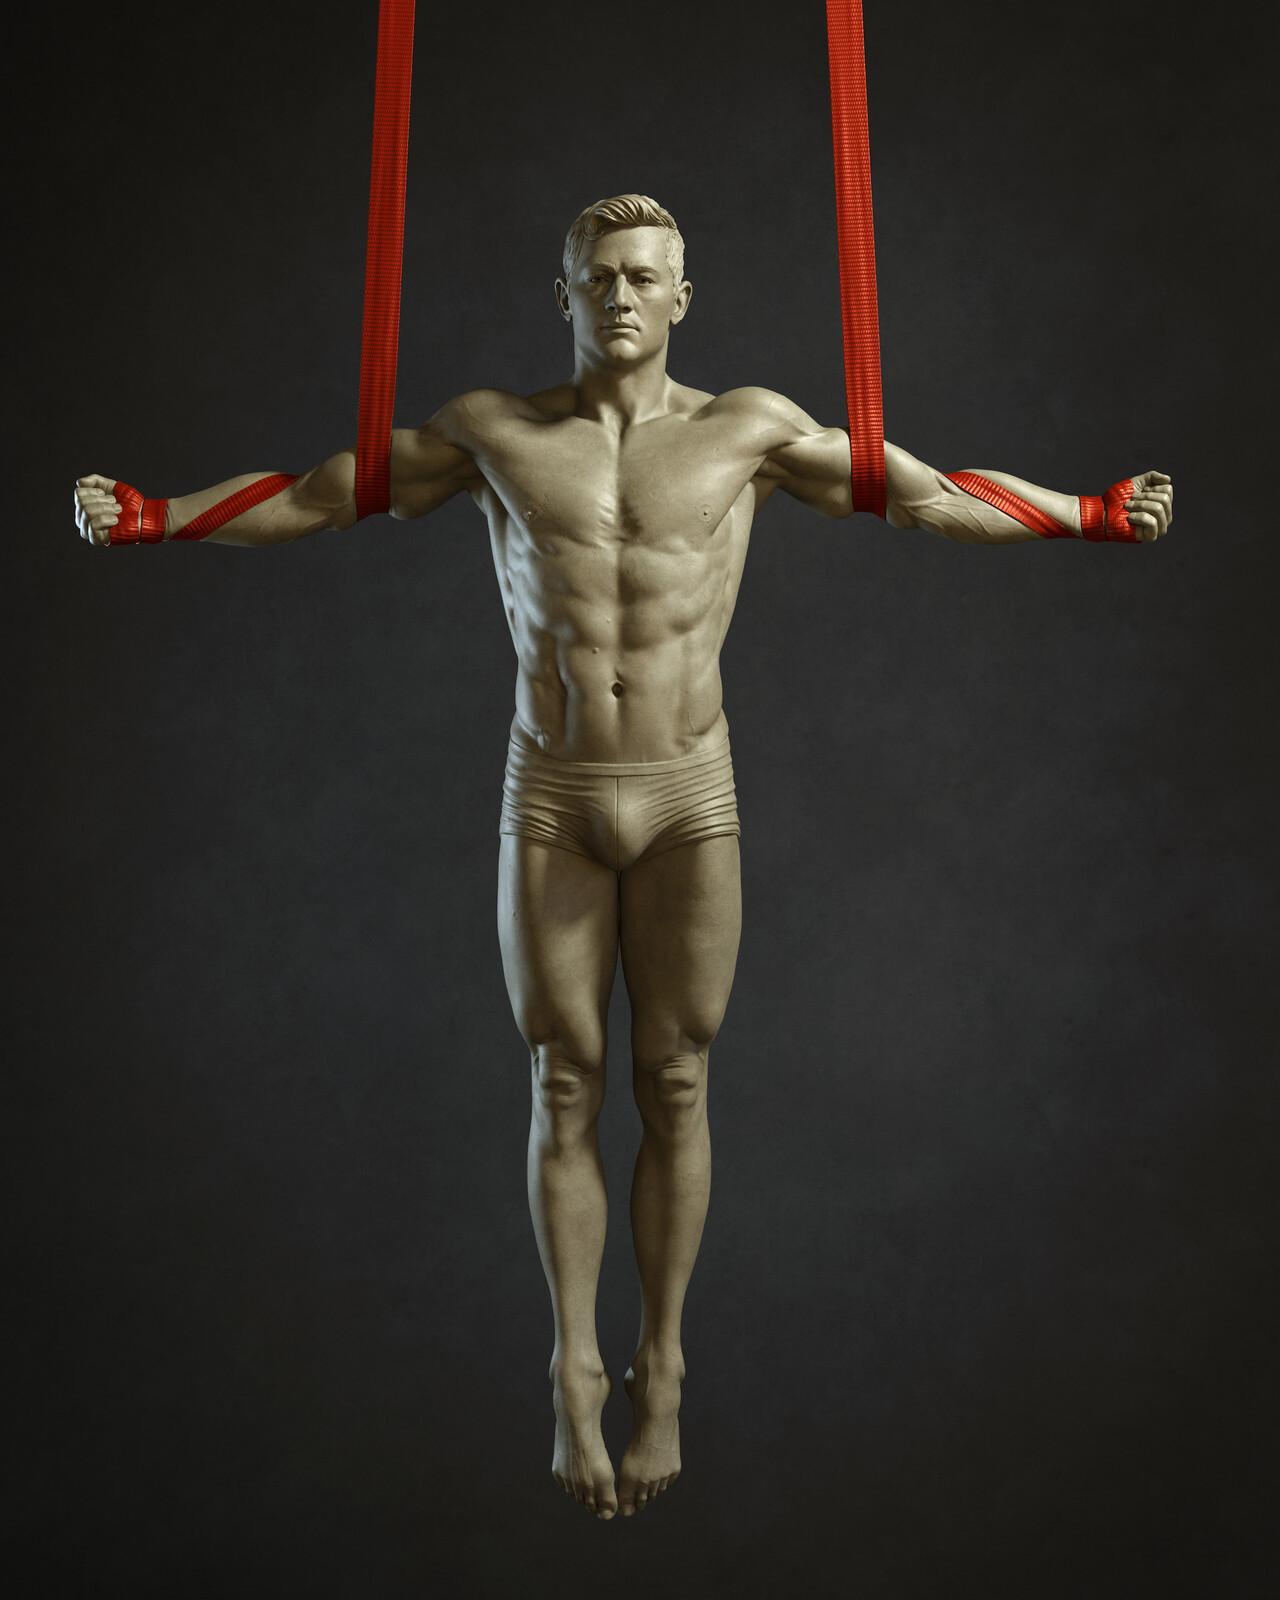 Male Straps 5 - Bodies in Motion (Anatomy Study)